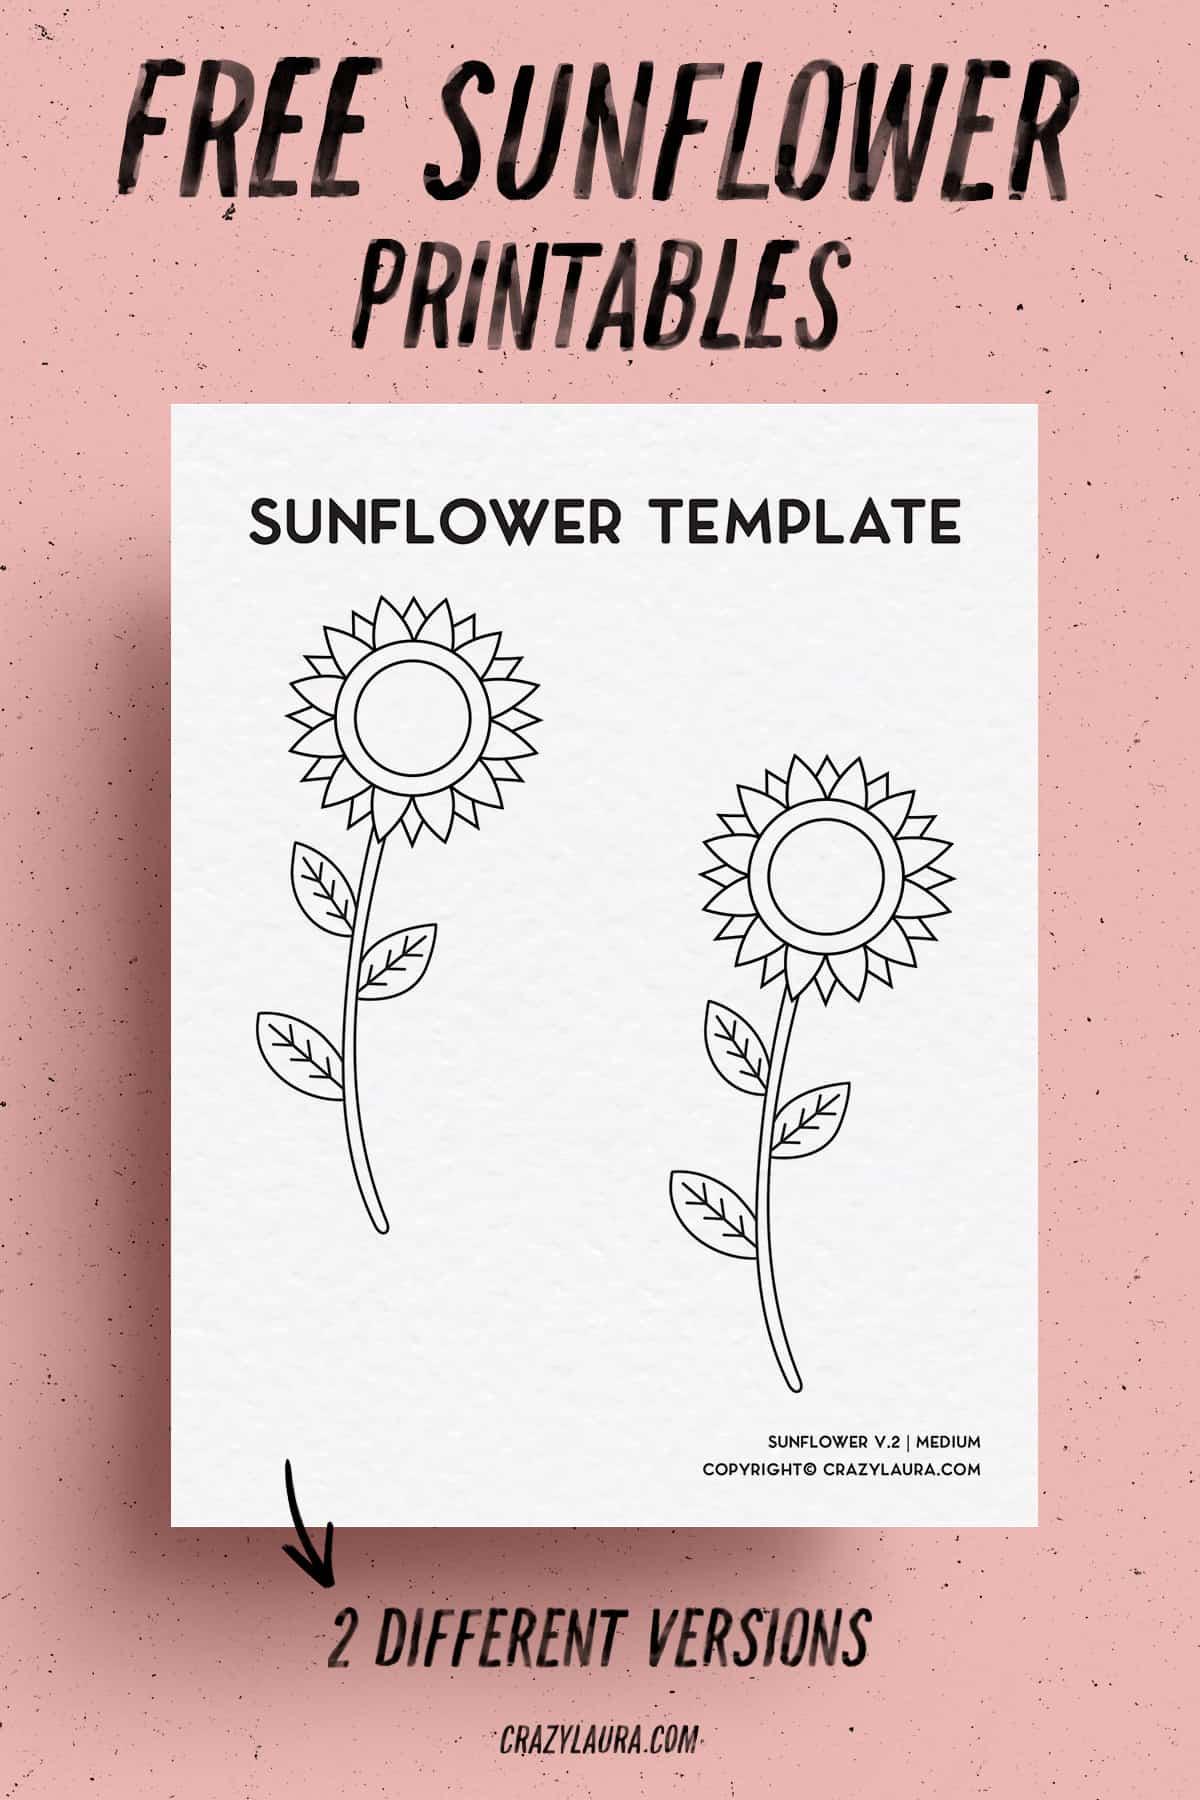 sunflower outline activity